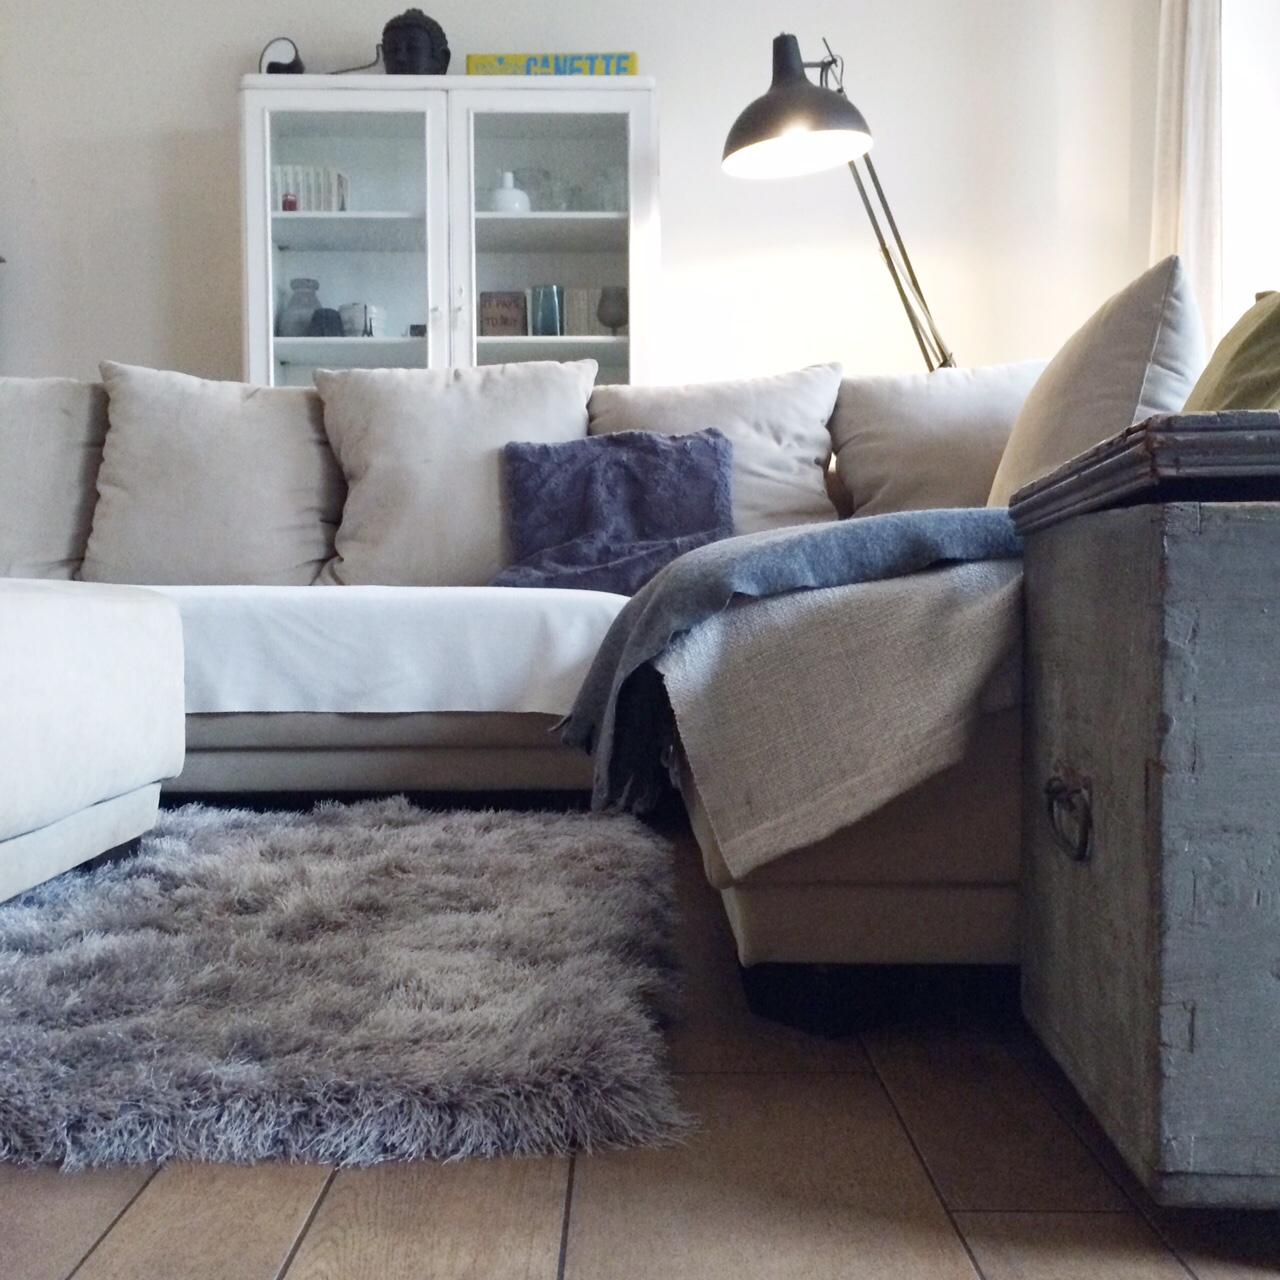 Safavieh carpet in our living-room